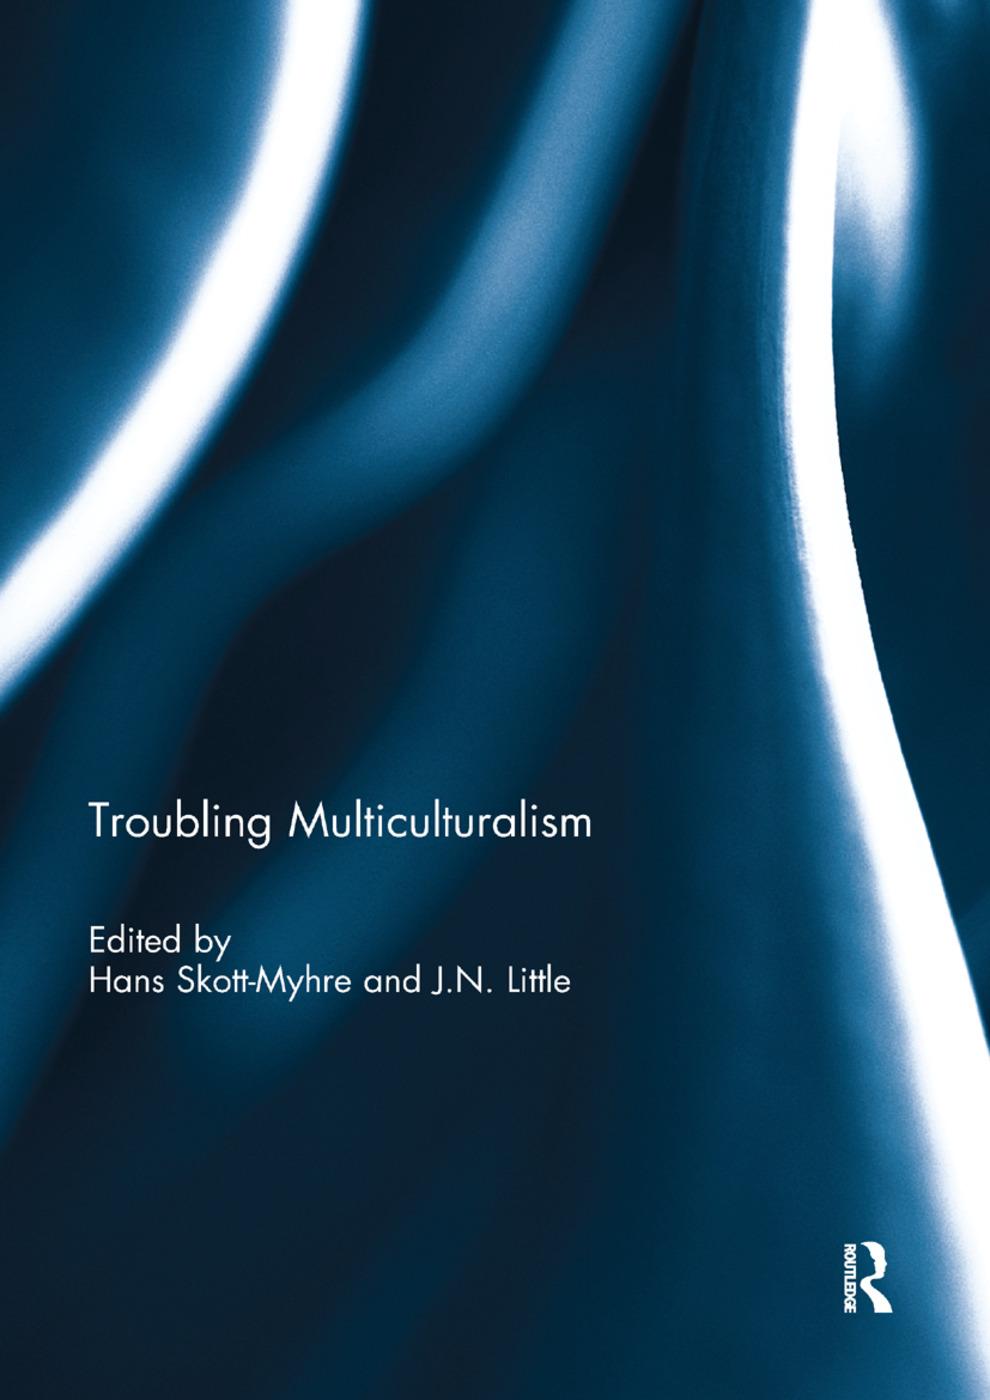 Troubling Multiculturalism